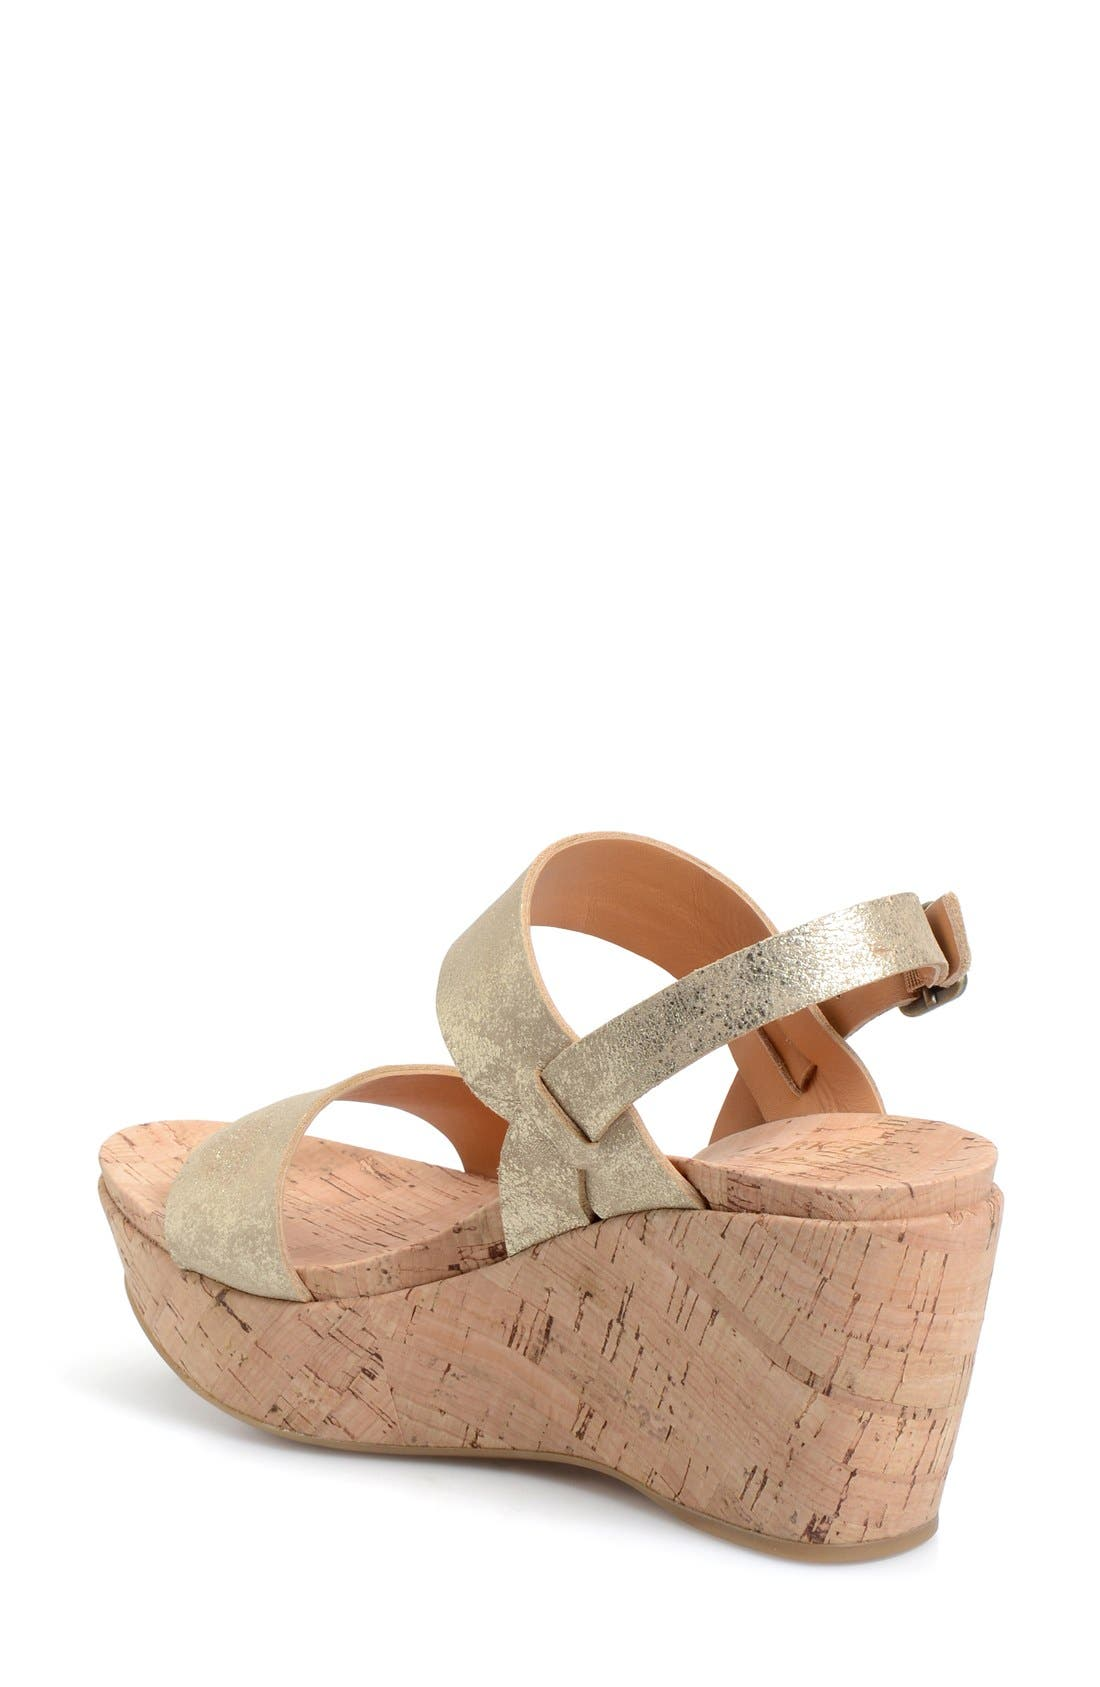 'Austin' Slingback Wedge Sandal,                             Alternate thumbnail 22, color,